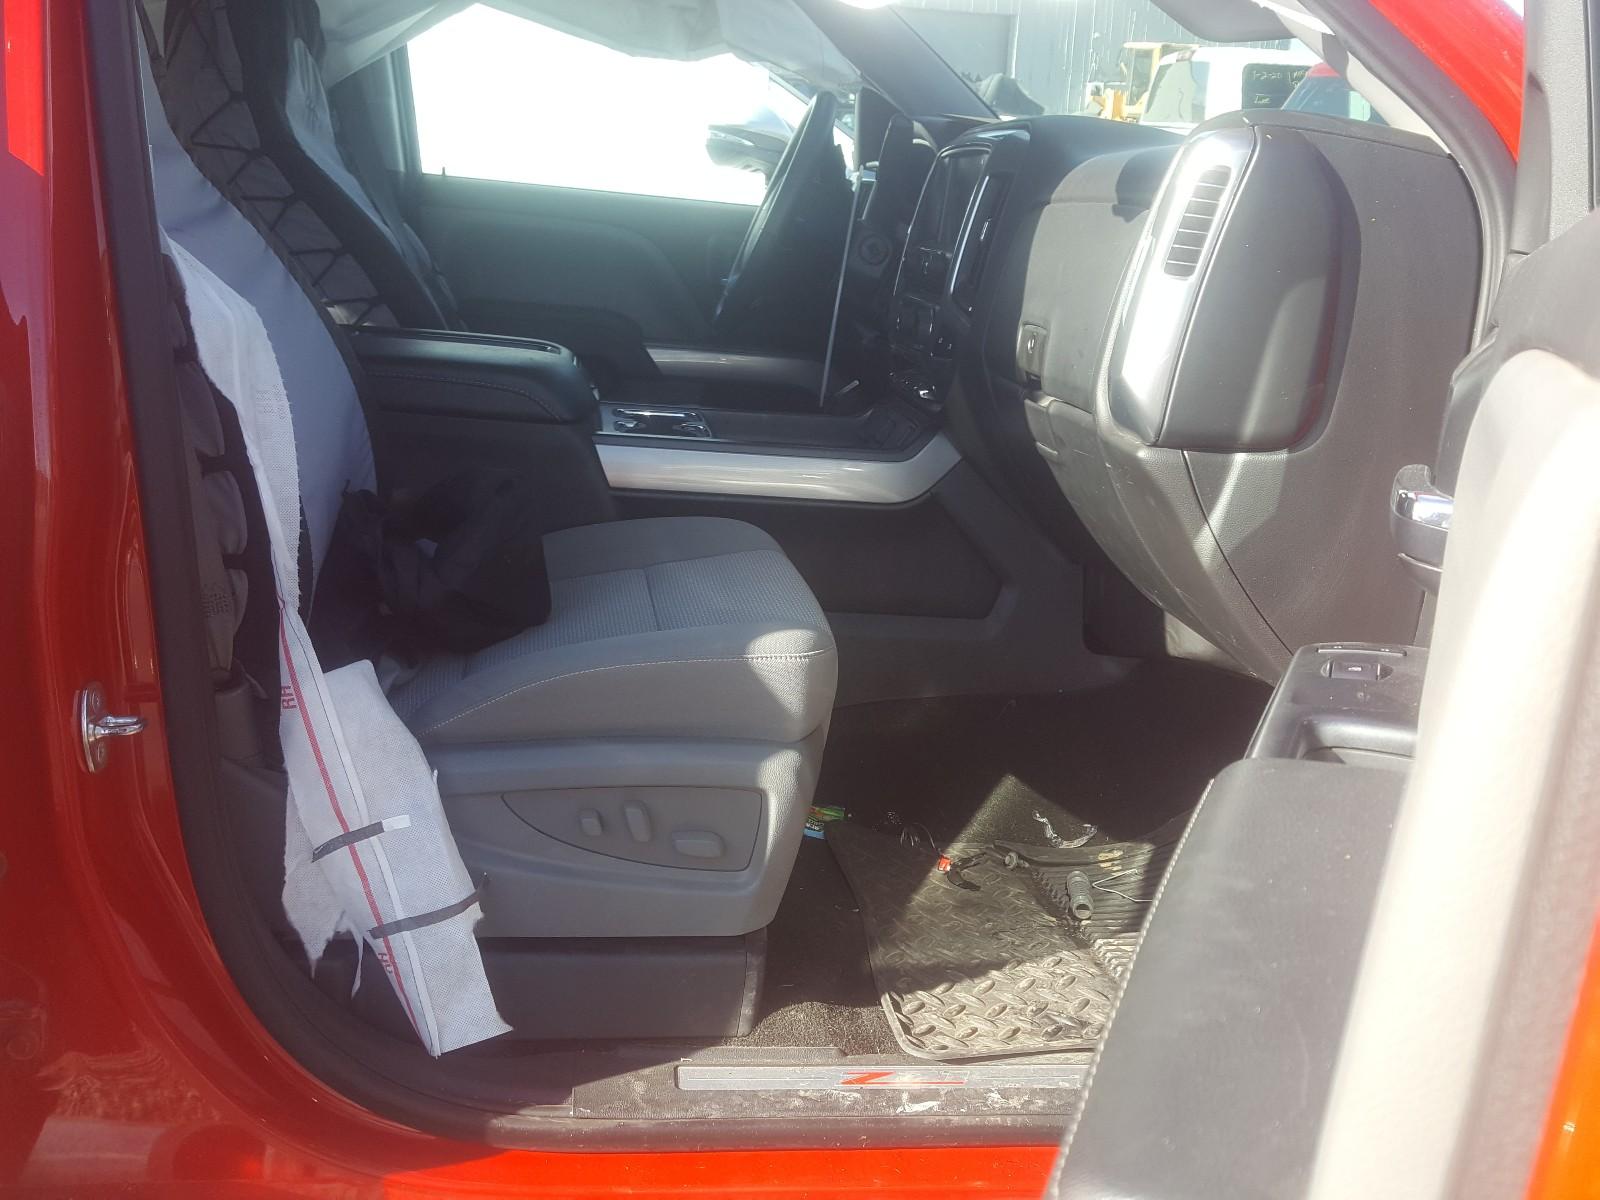 3GCUKREC0EG546934 - 2014 Chevrolet Silverado 5.3L close up View